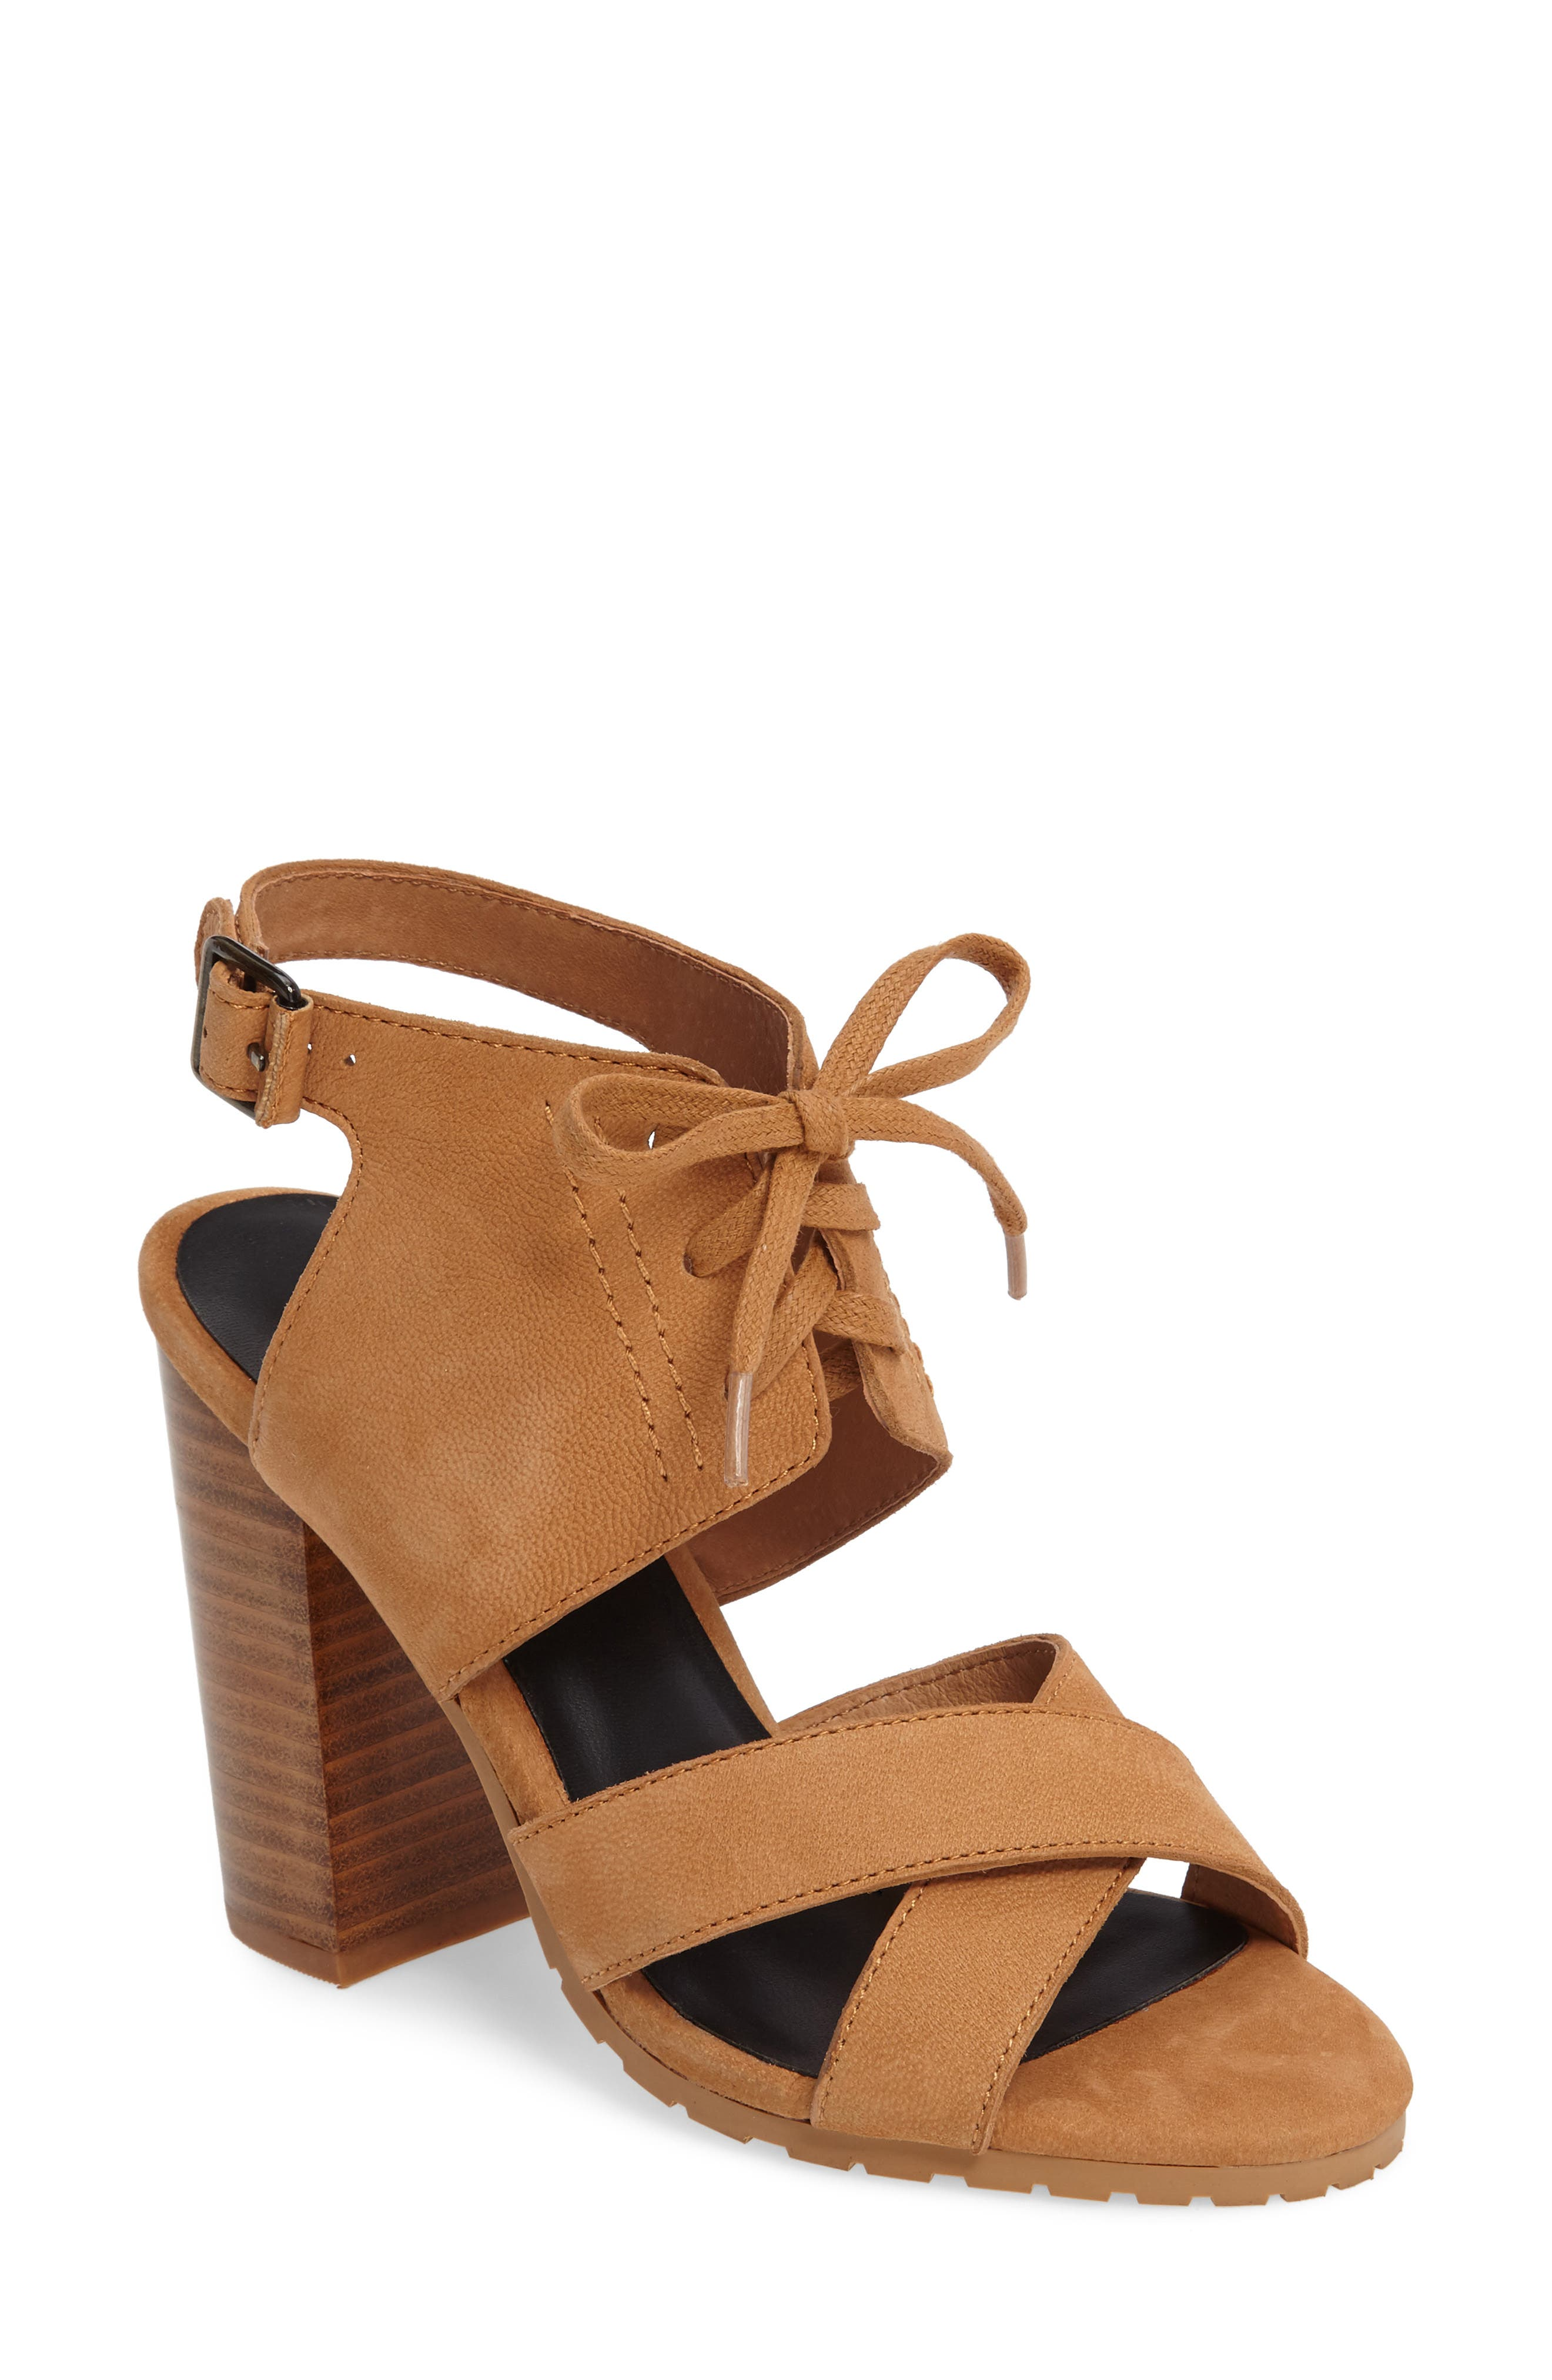 M4D3 Madi Block Heel Sandal (Women)